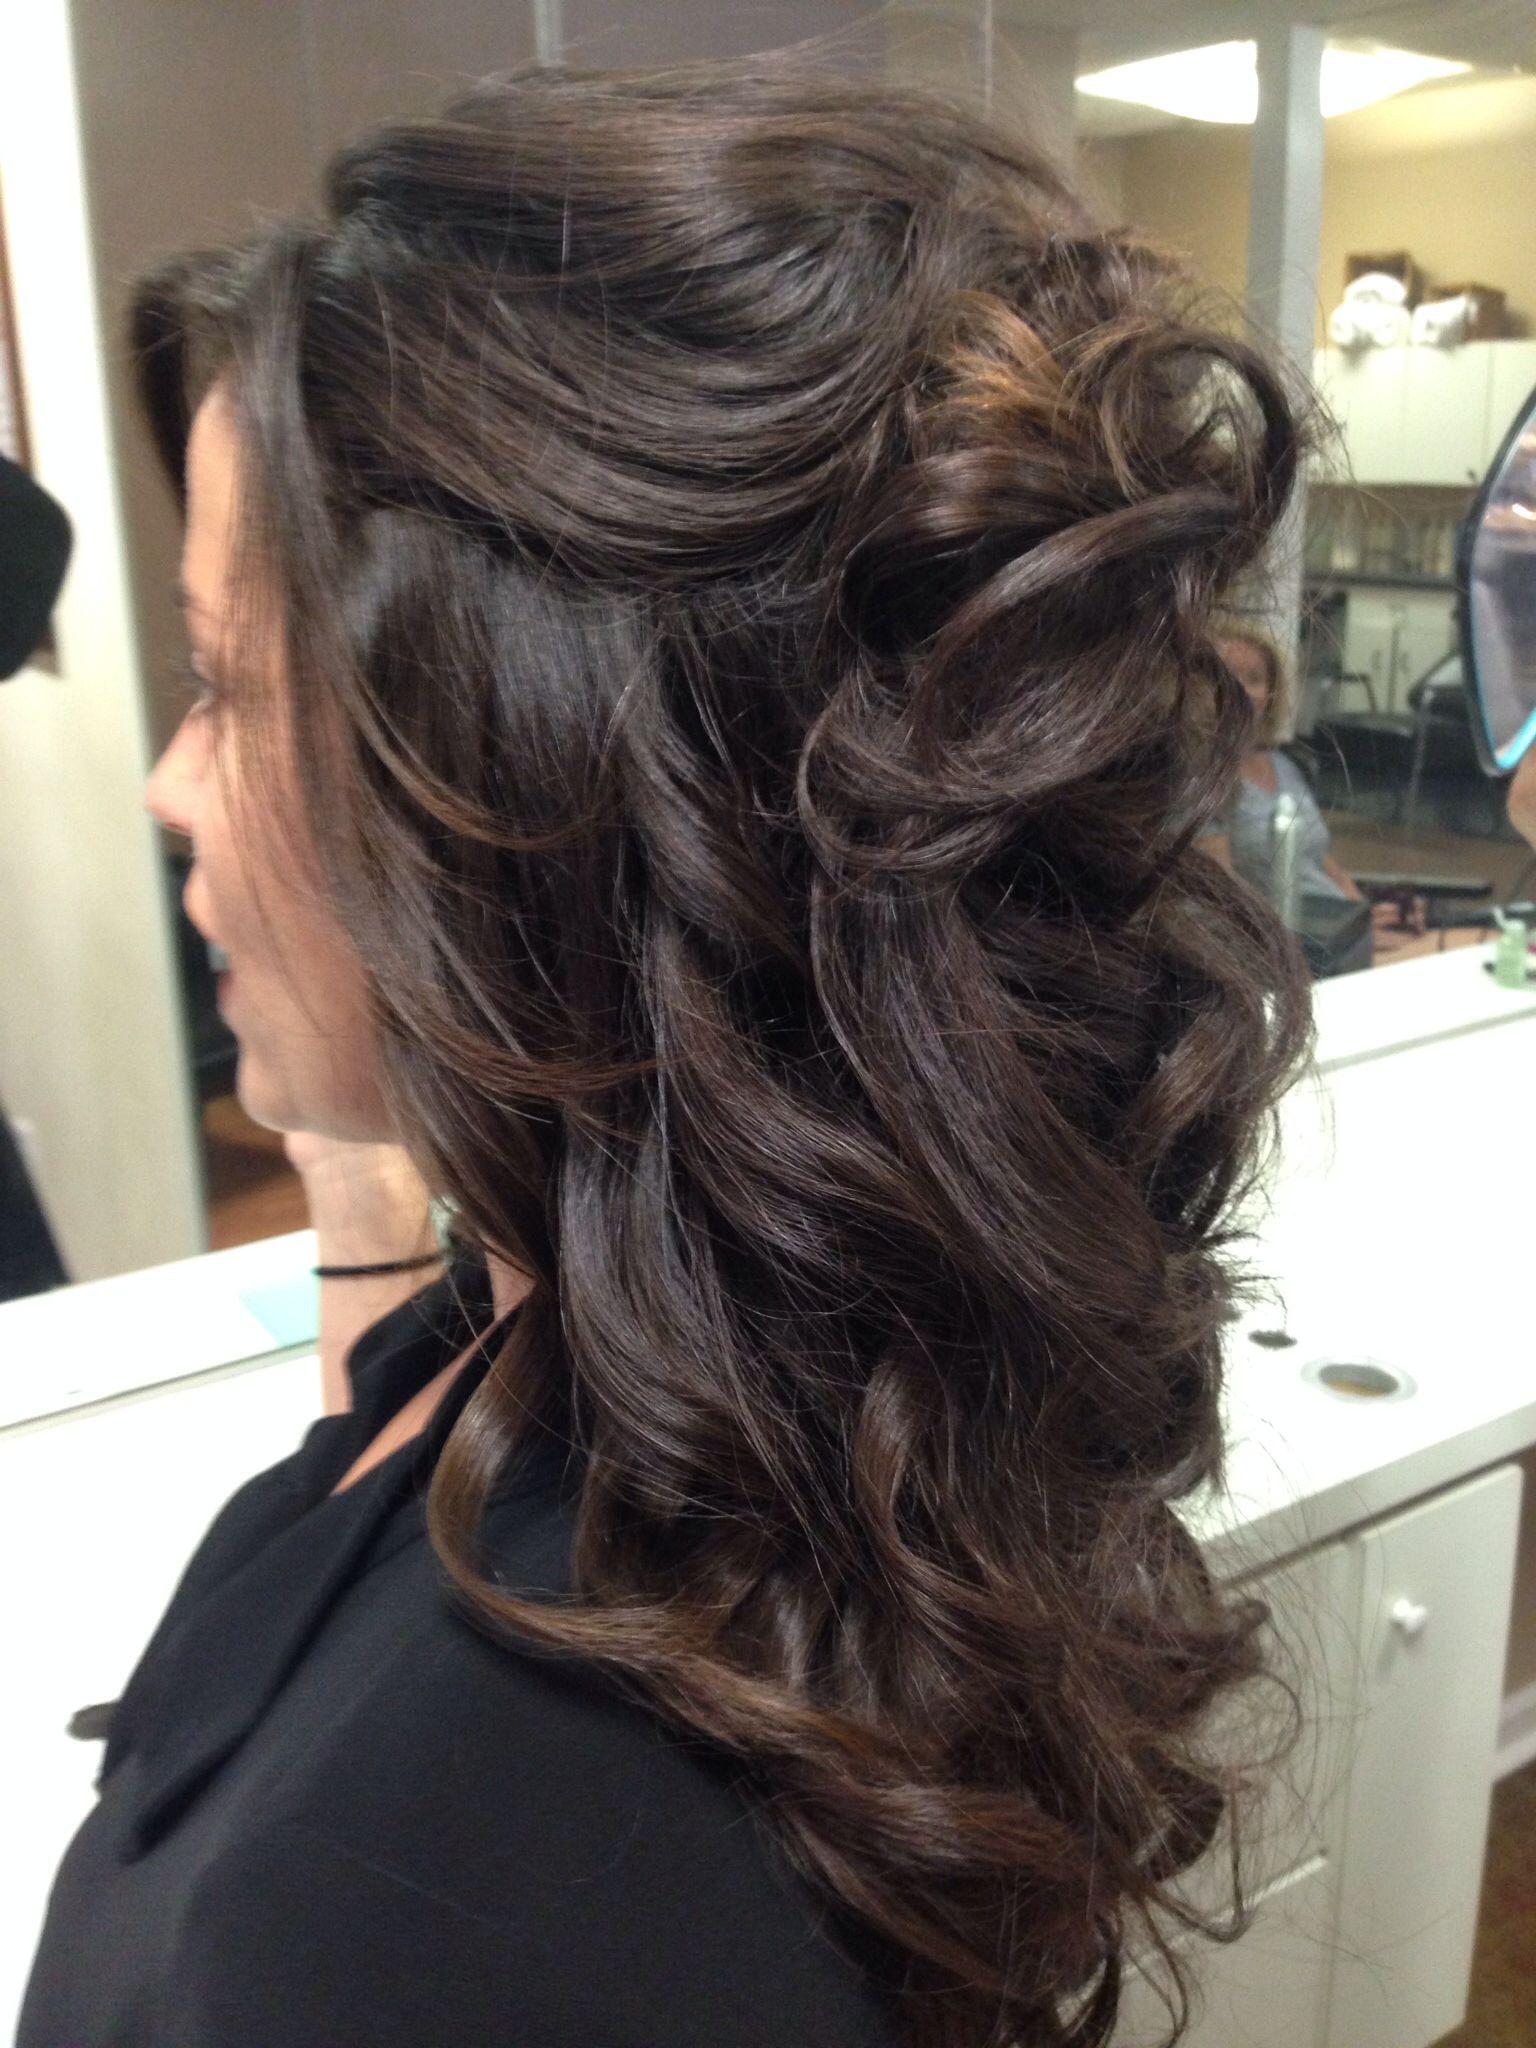 Wedding Or Prom Hair By Elena Aveda J Thomas Salon Spa Jacksonville Nc 910 938 3444 Hair Beauty Beauty Hair Styles